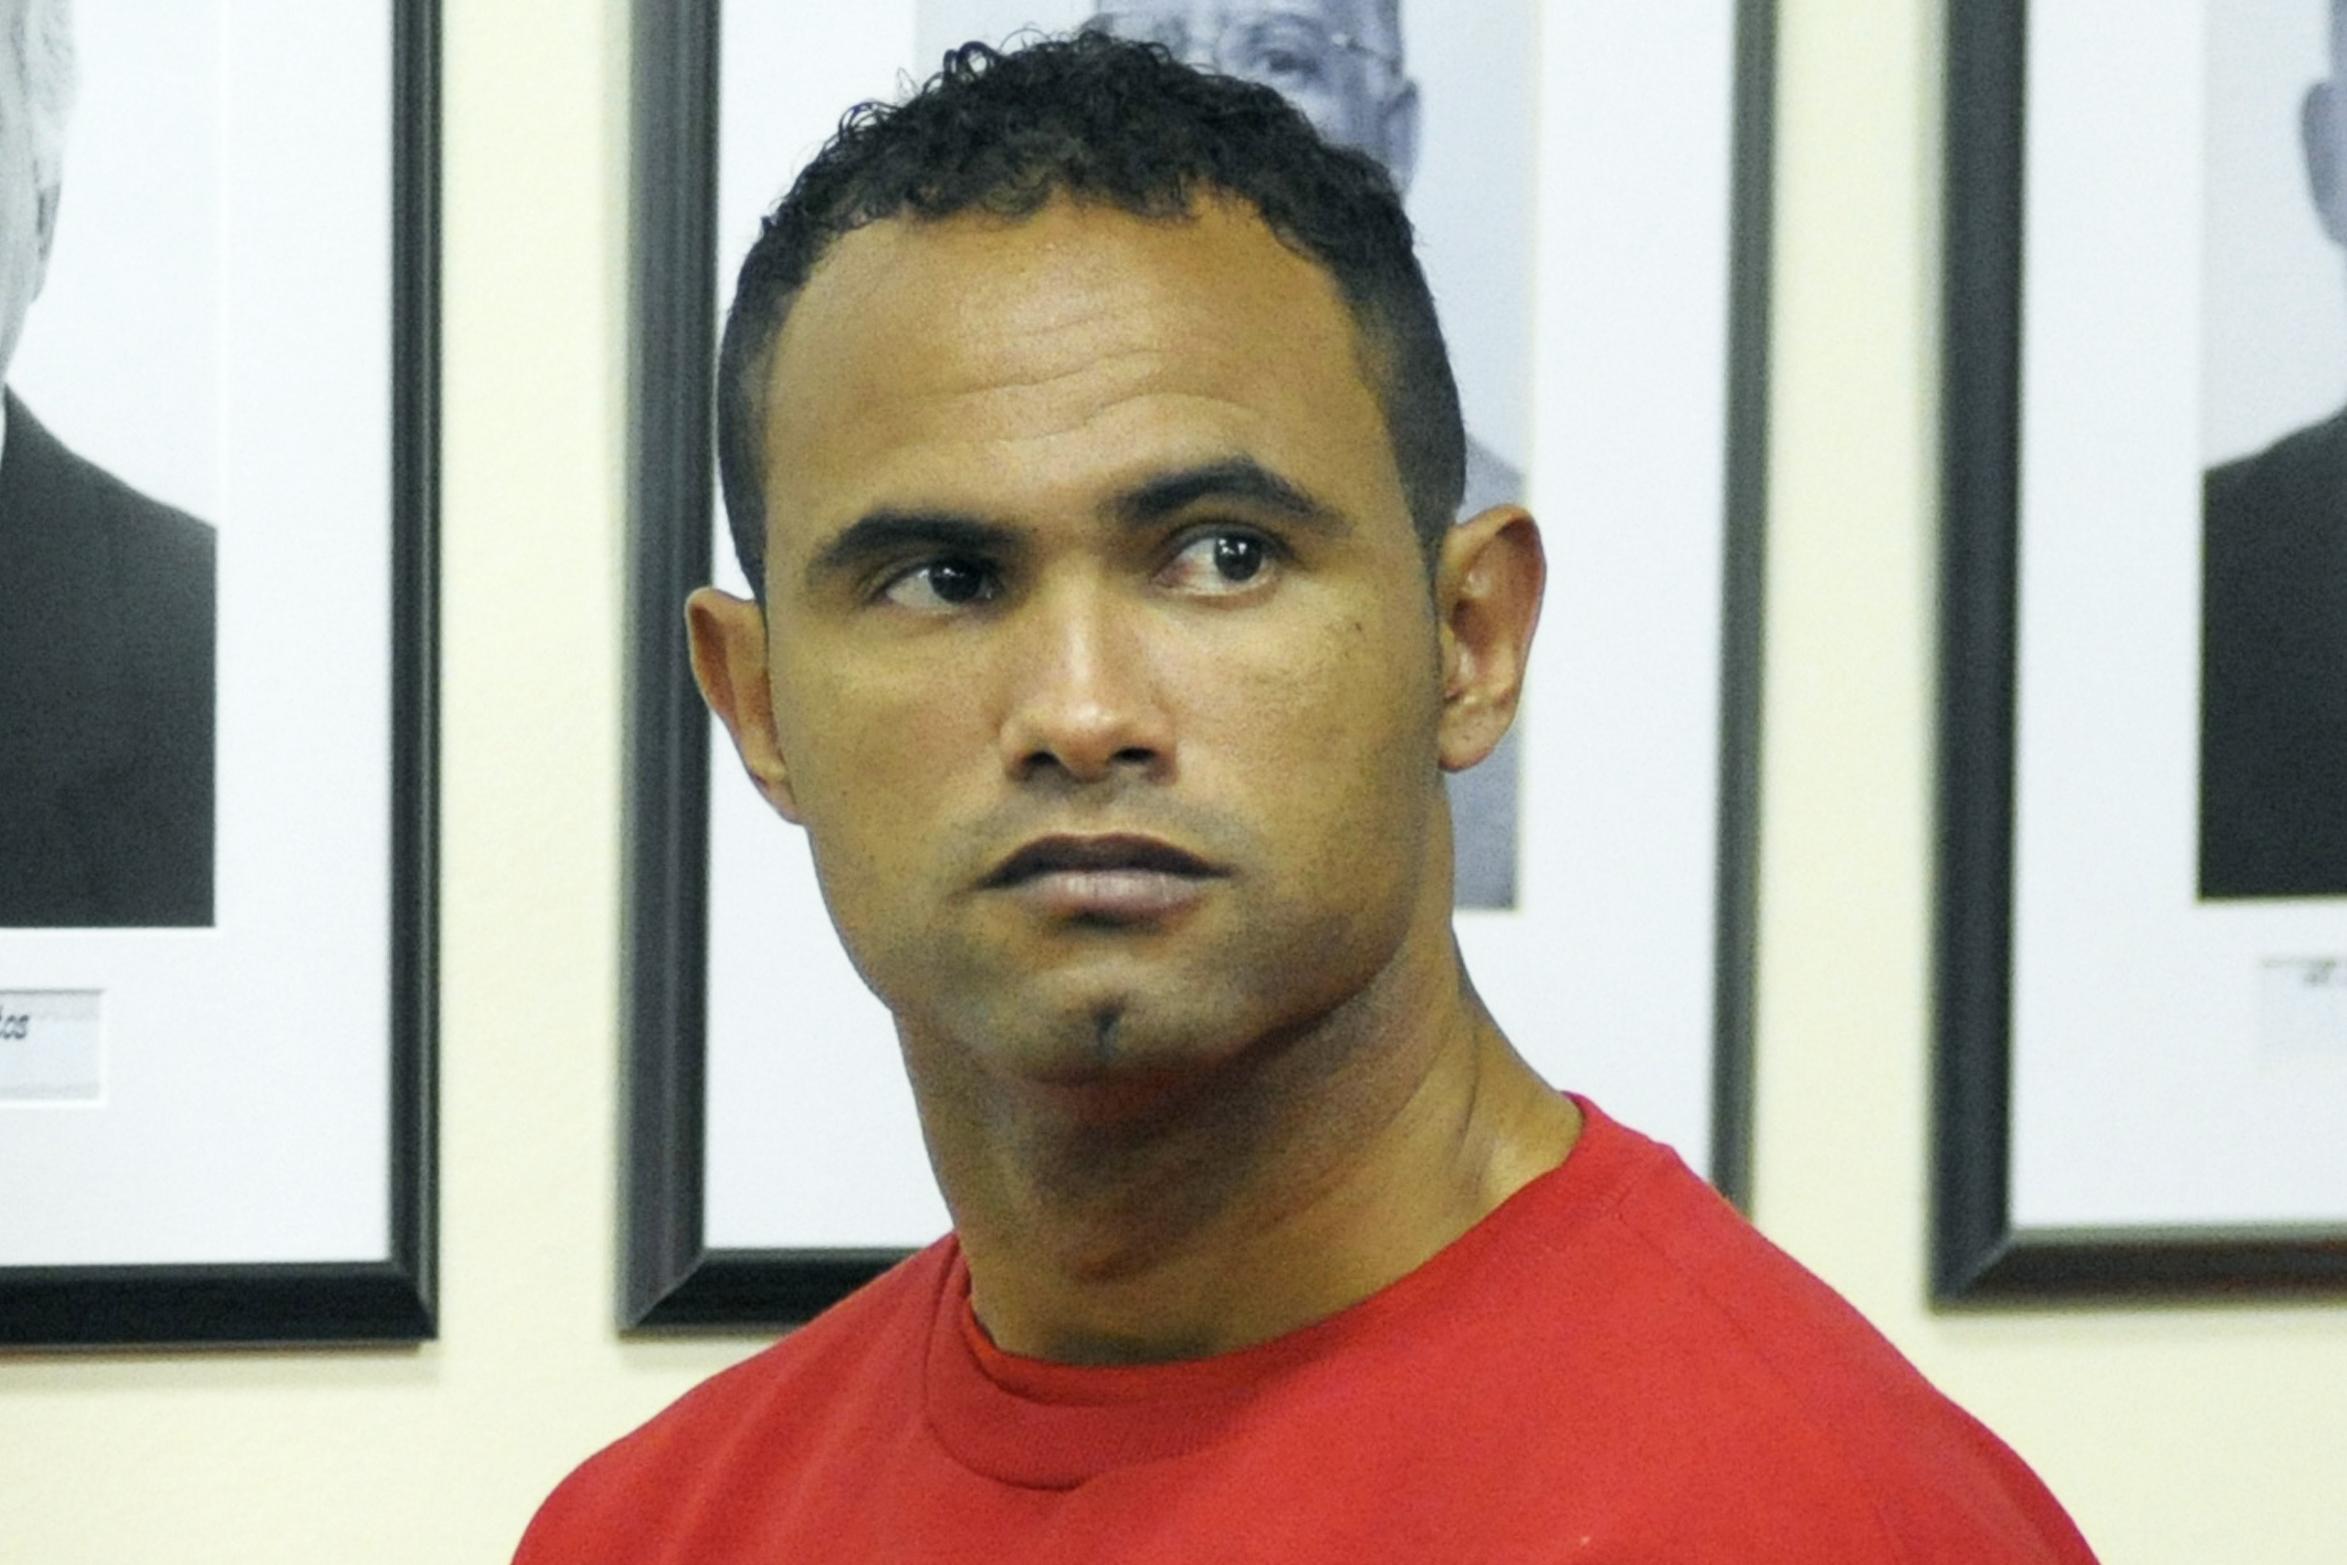 Bruno Fernandes de Souza, during his trial in Contagem, Minas Gerais, Brazil, on Nov. 20, 2012.